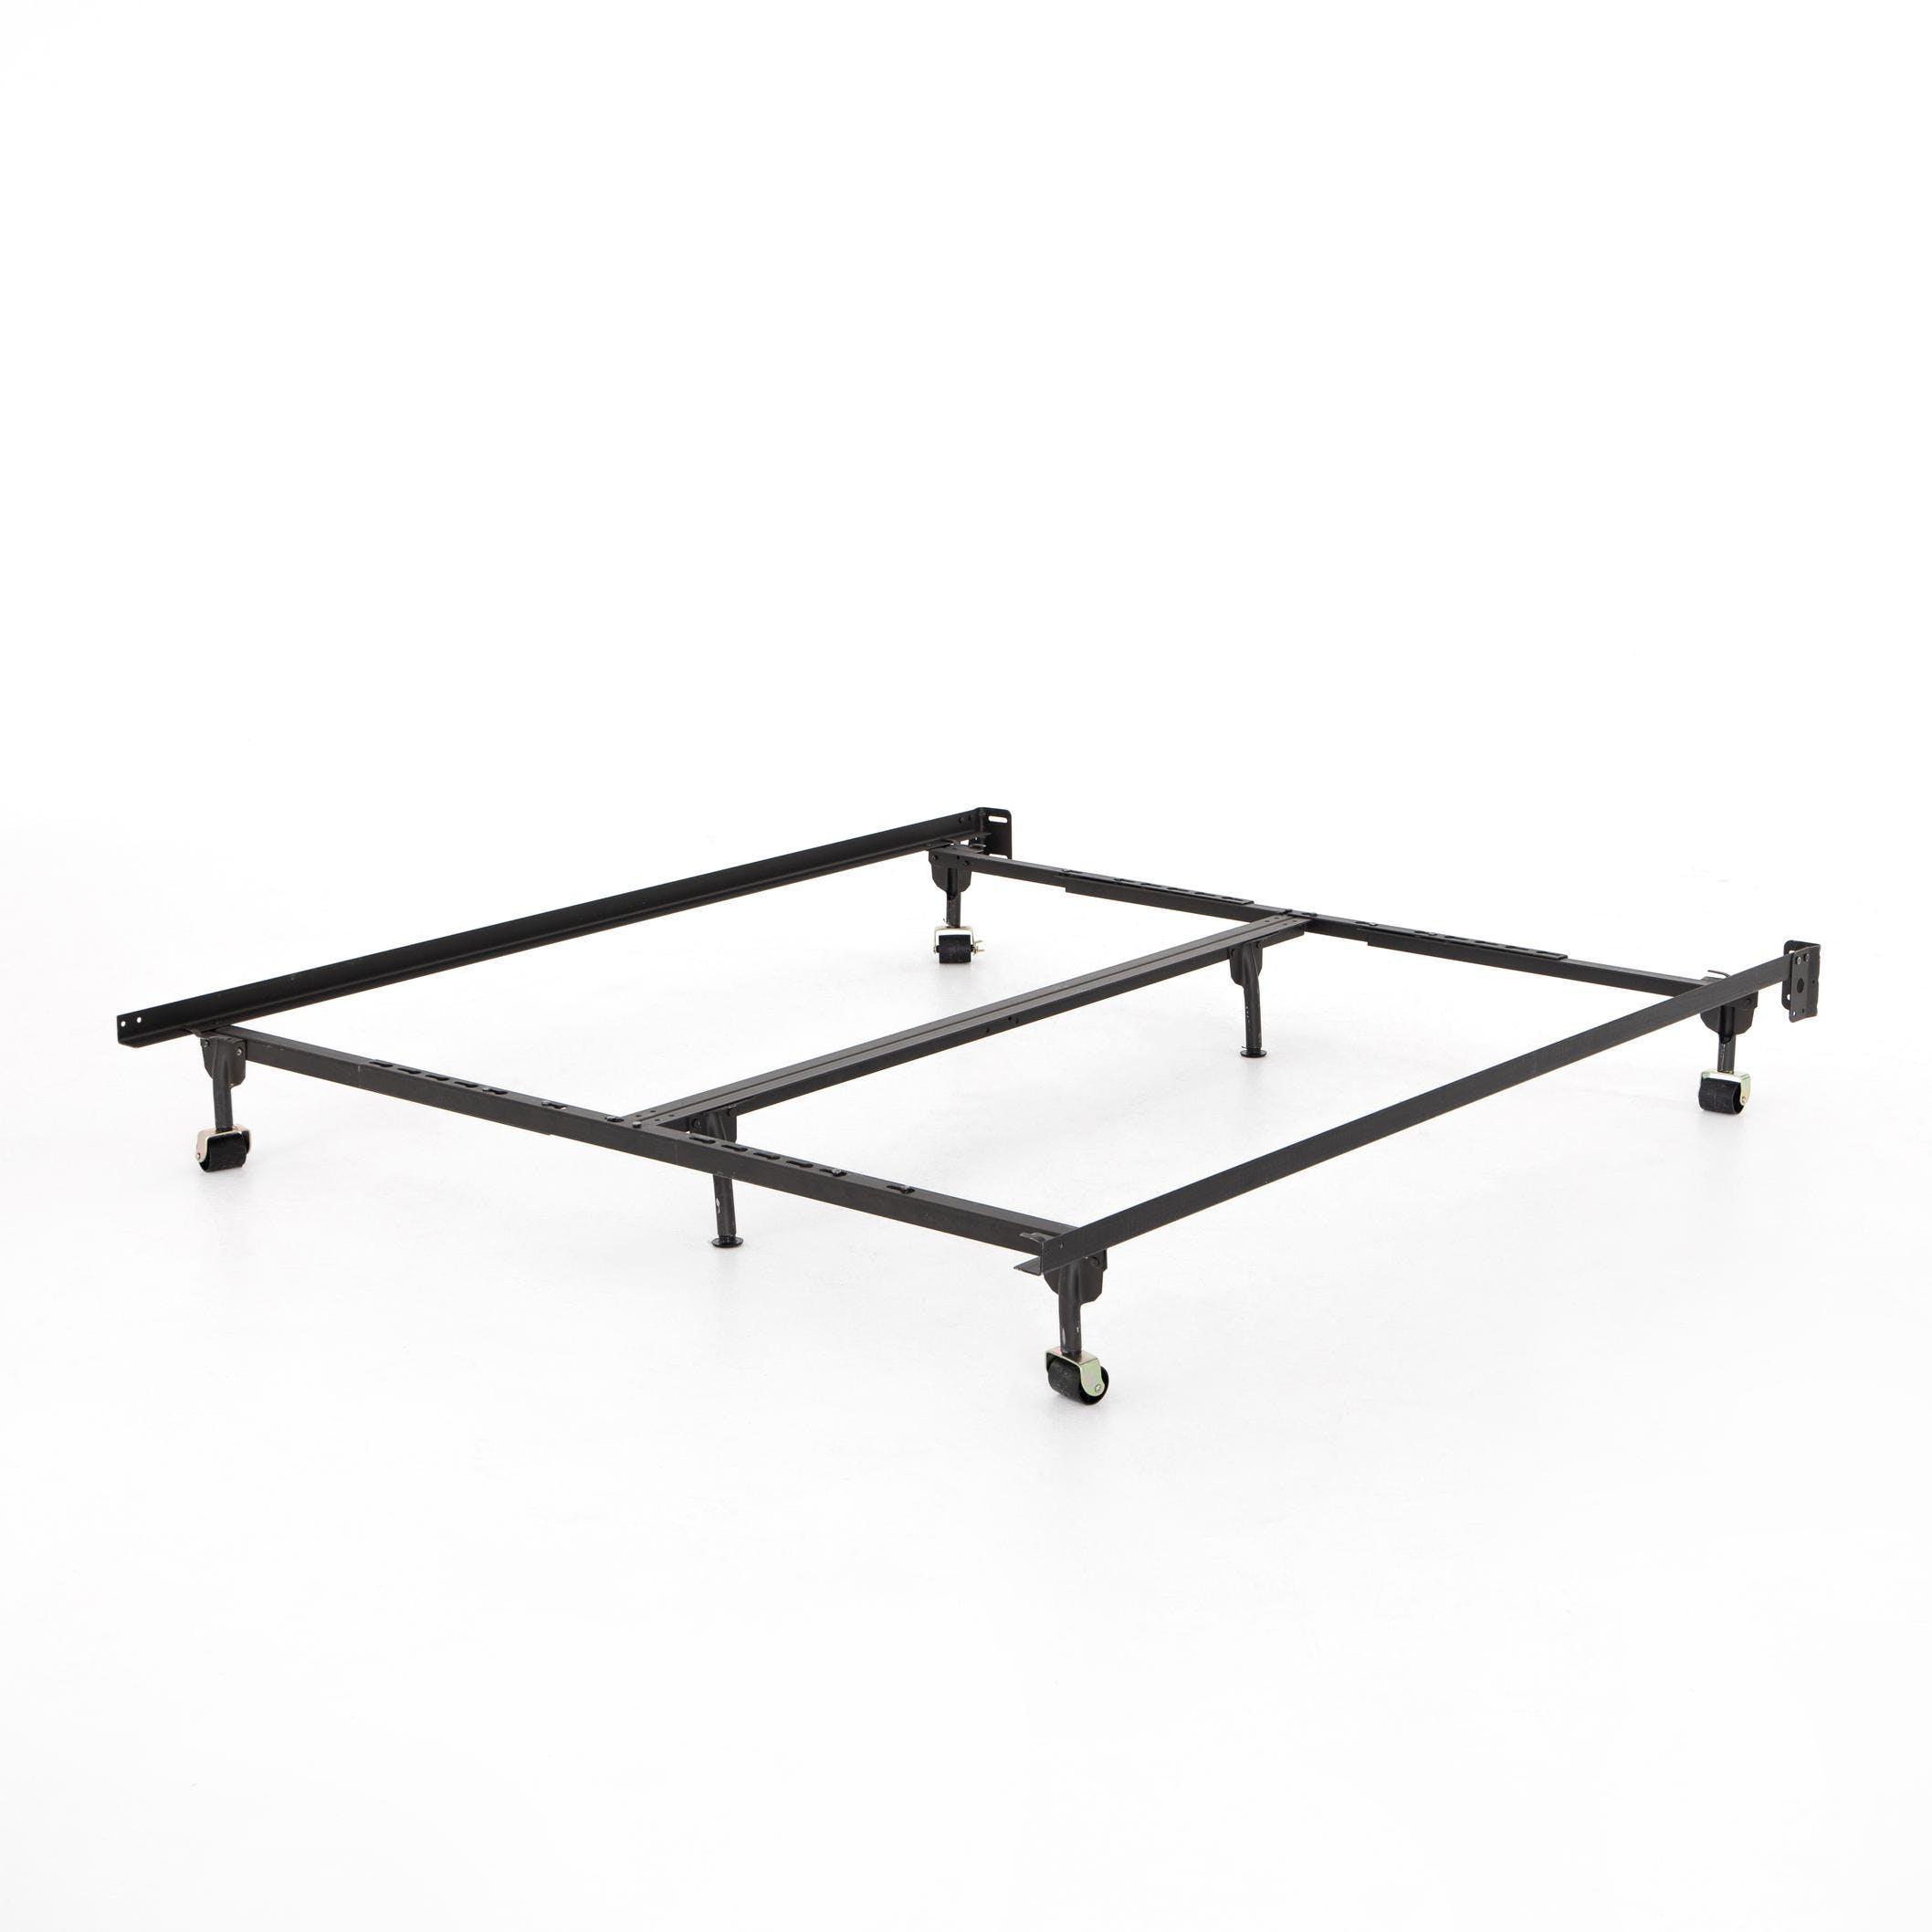 Four Hands Metal Bed Frame Black King Cal King 223420 002 Portland Or Key Home Furnishings